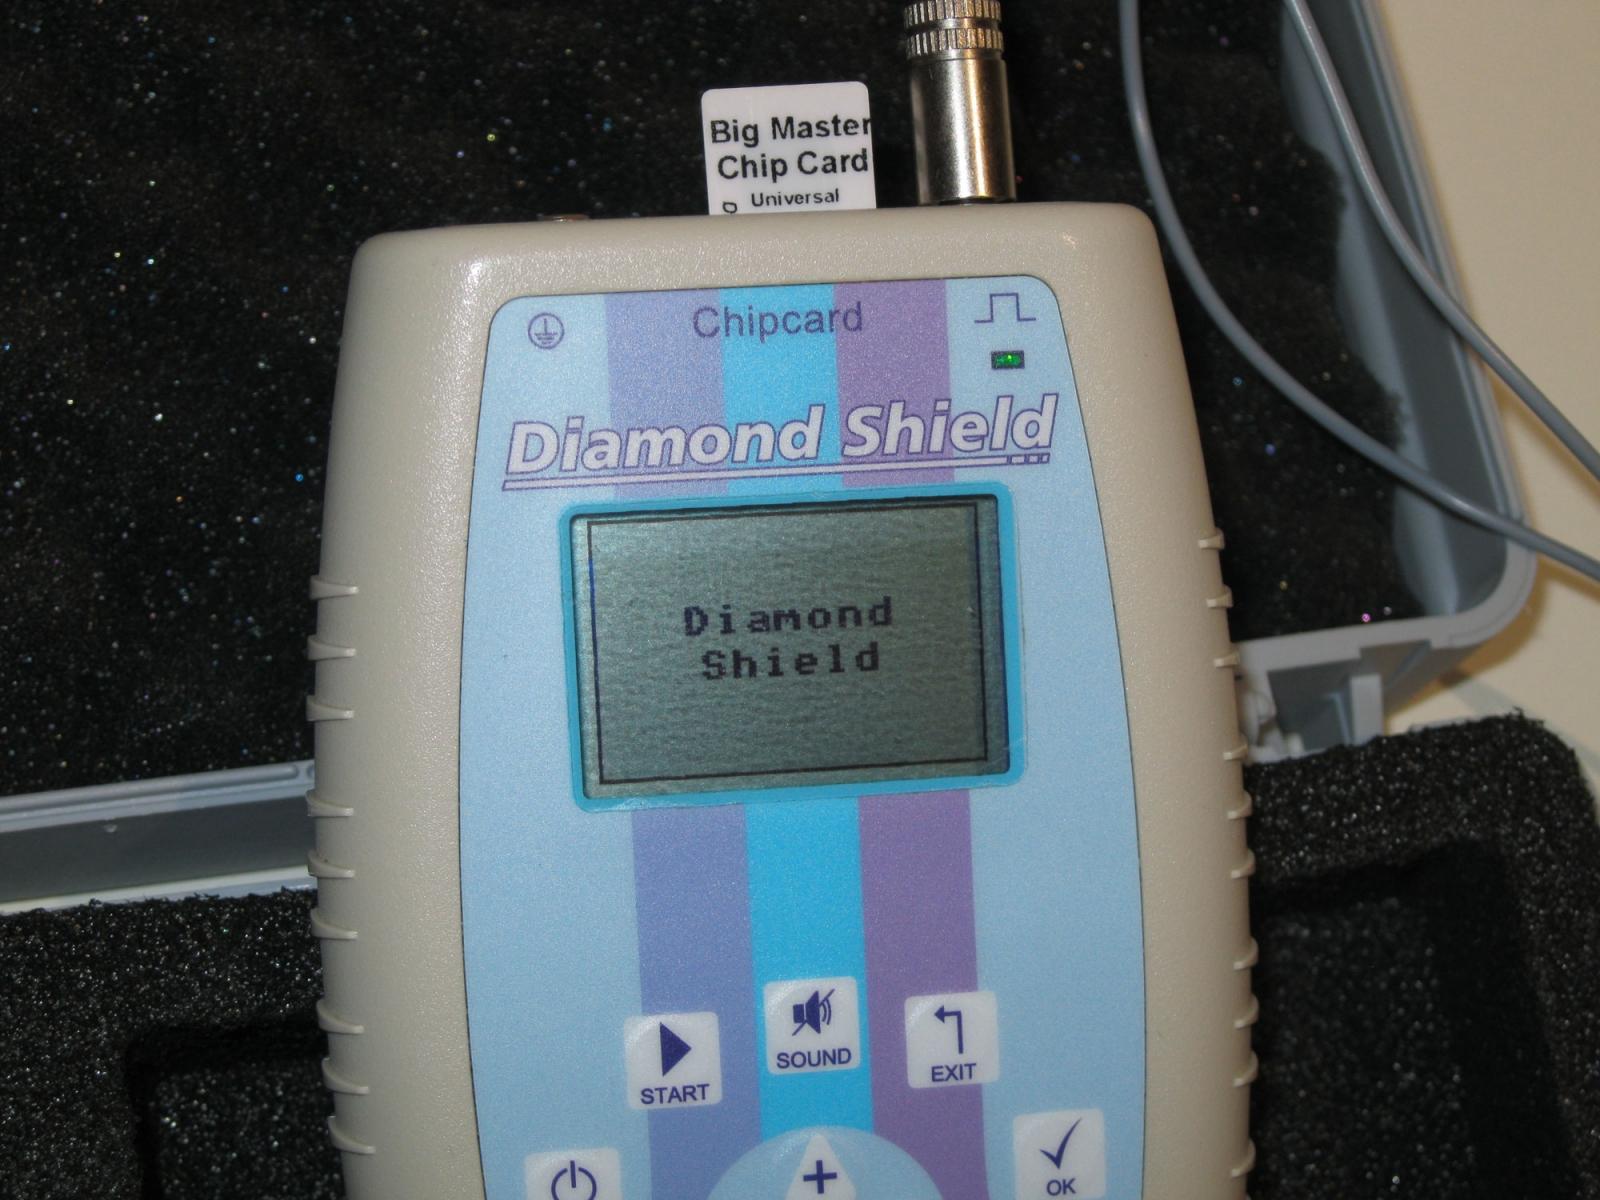 Diamond-Shield-Zapper-mit-Maserchip-Karte